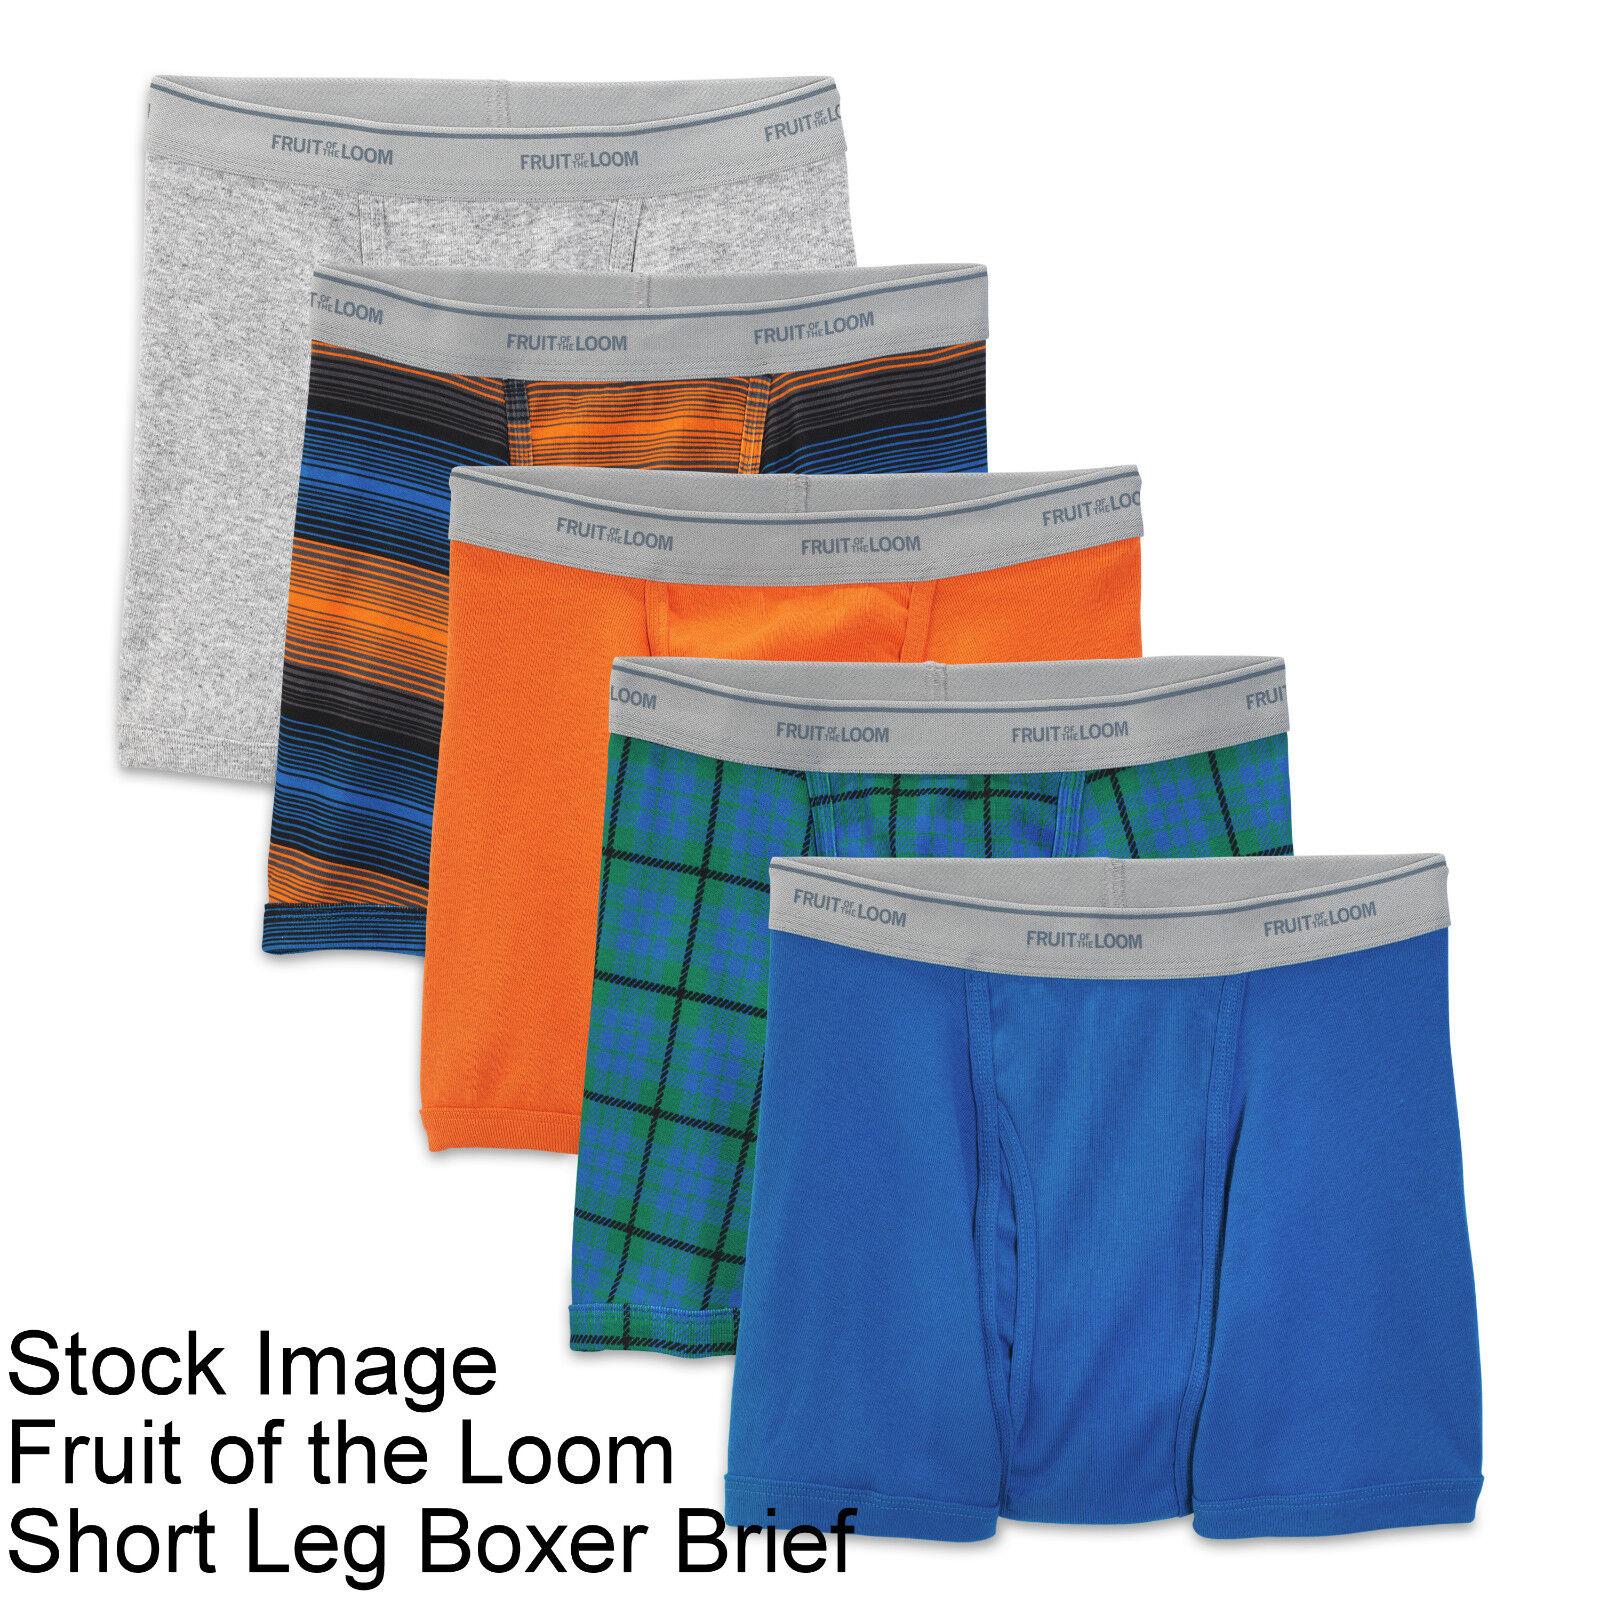 10 Prints Solids XL 40-42 Inch Short Leg Boxer Brief Fruit Of The Loom 102-107CM